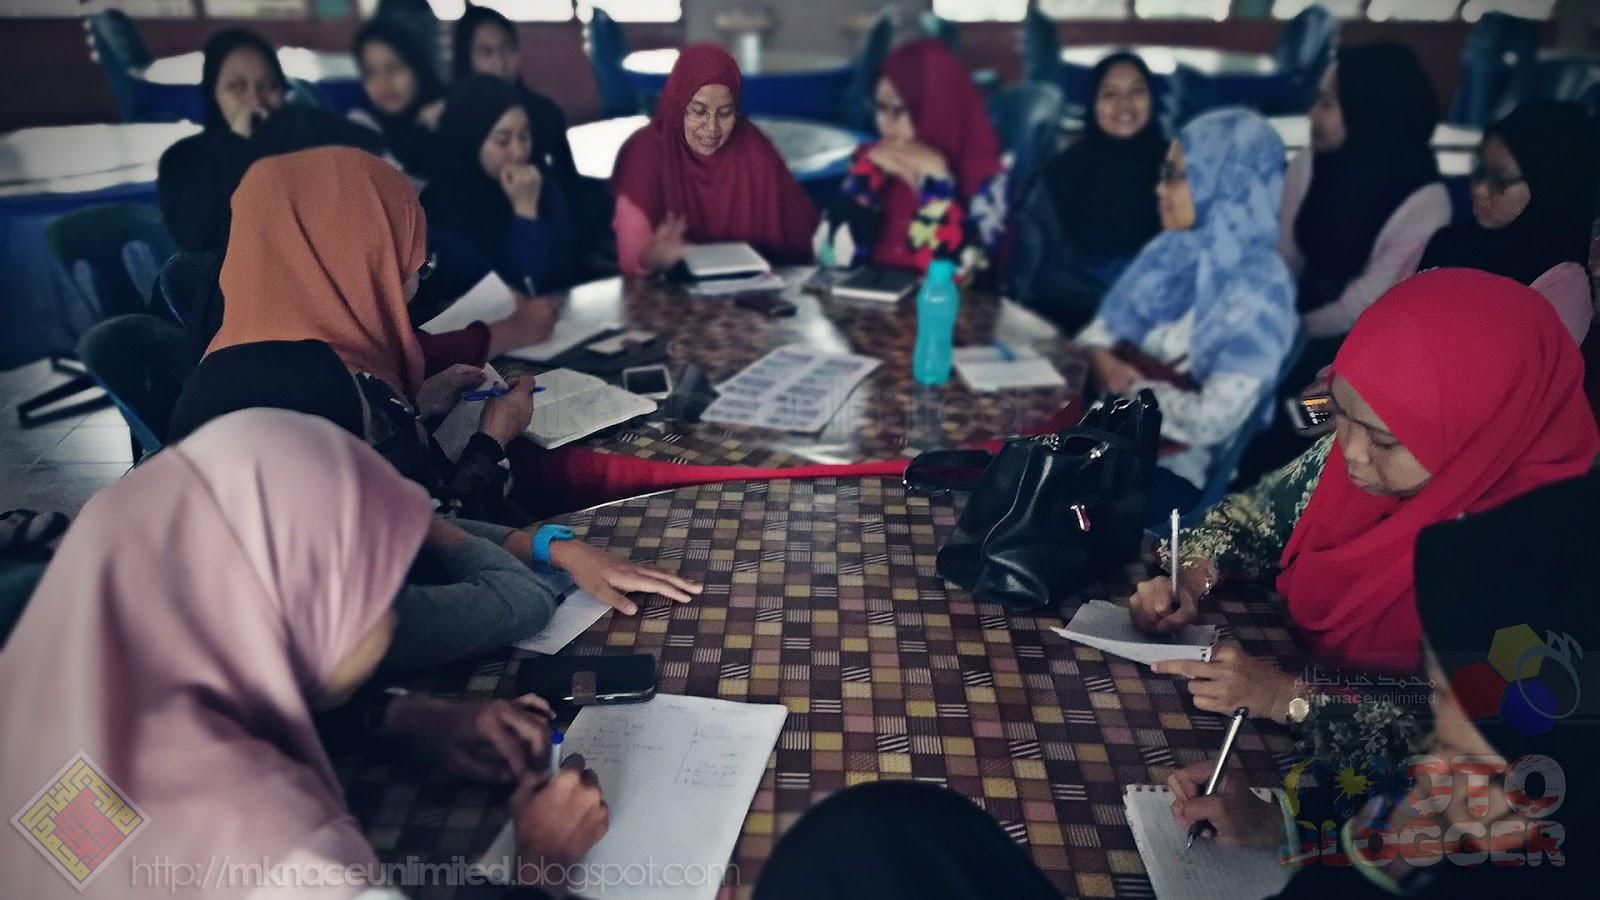 Sekolah Tun Fatimah 20181006 Mesyuarat Ajk Kerja Program Roti Tissue By Canai Ikhwan Gh Corner Mks 2018 10 06 173413